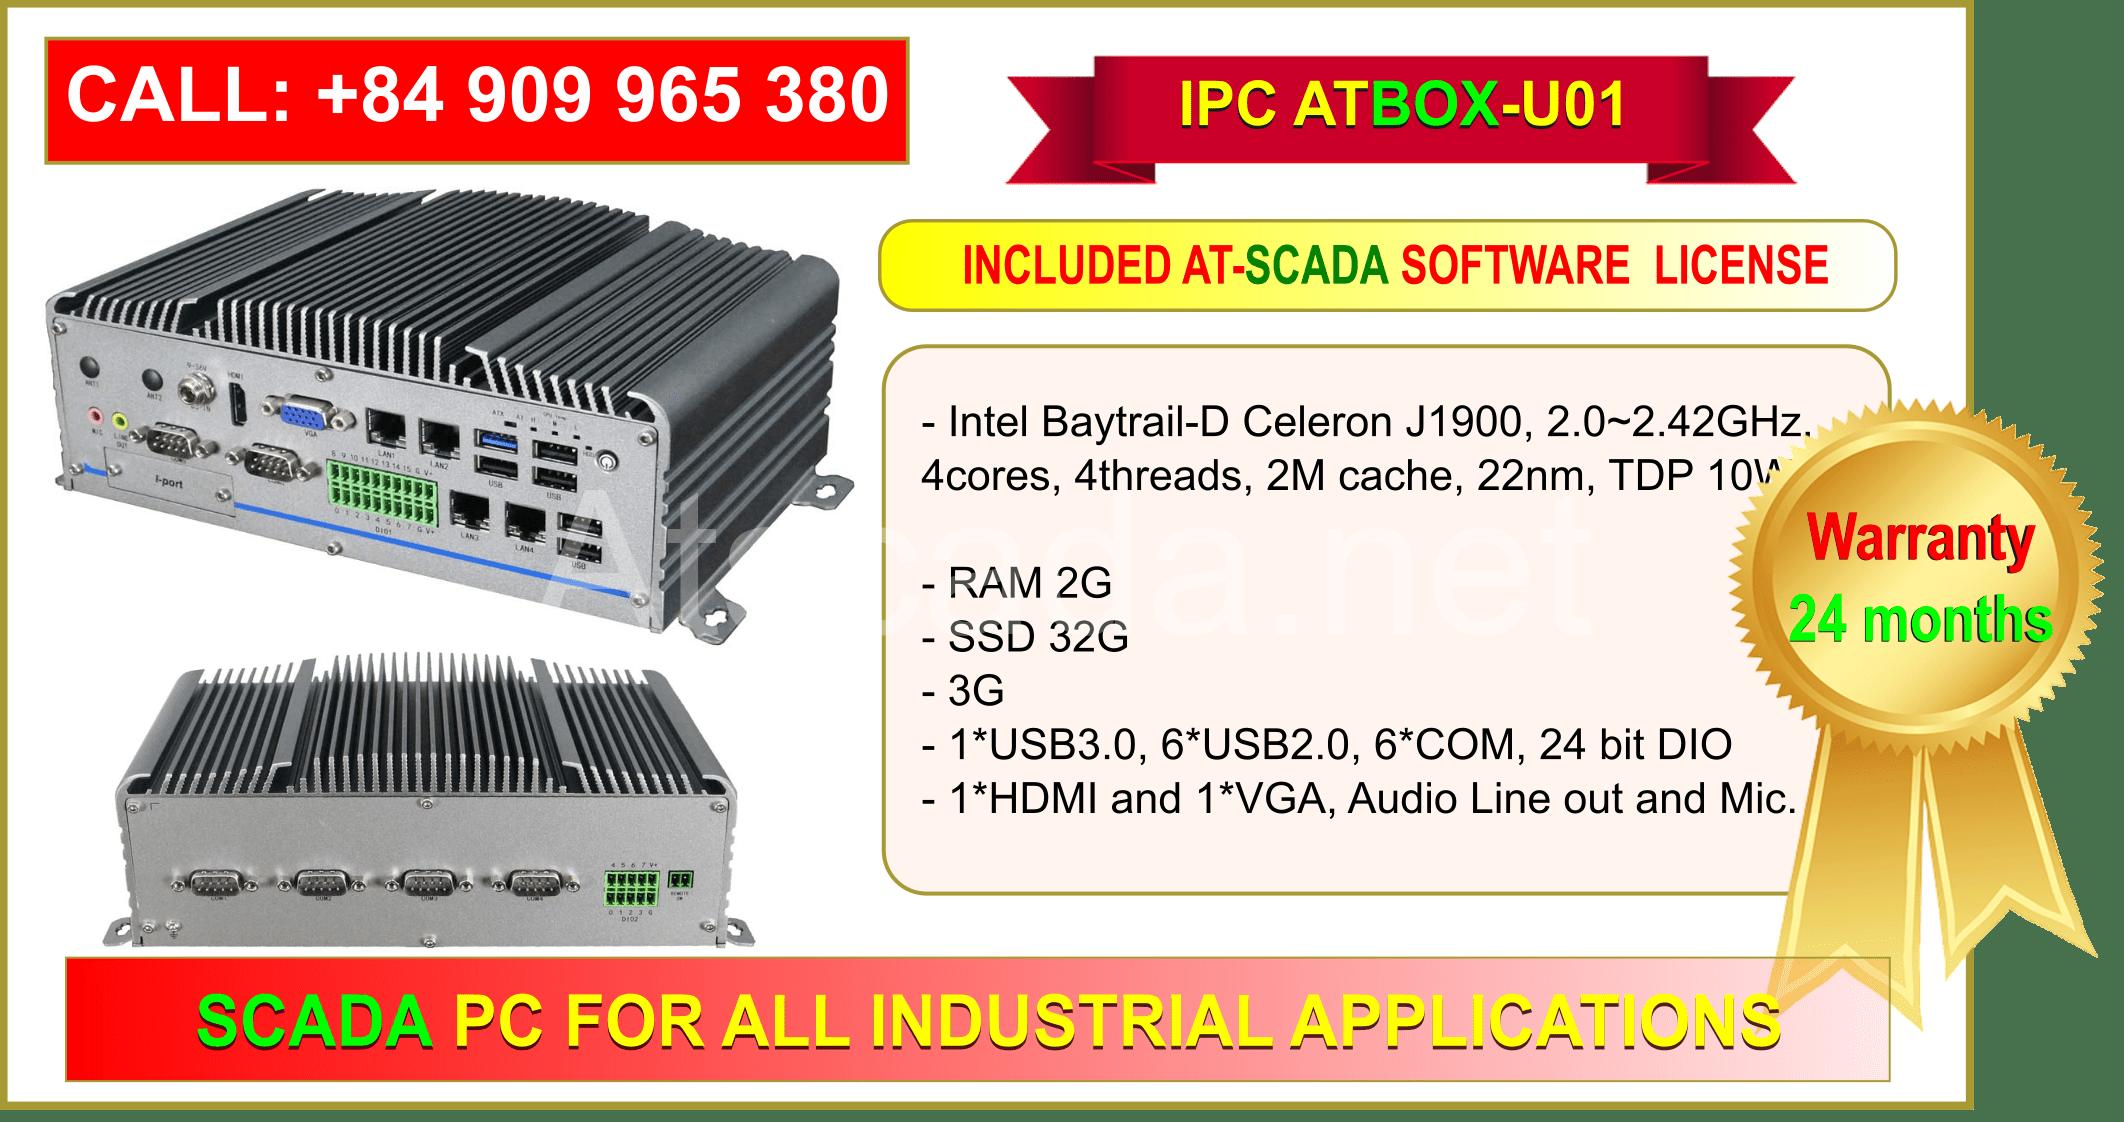 ATBOX-U01 Intel Celeron RAM 2GB - Full ATSCADA Software License